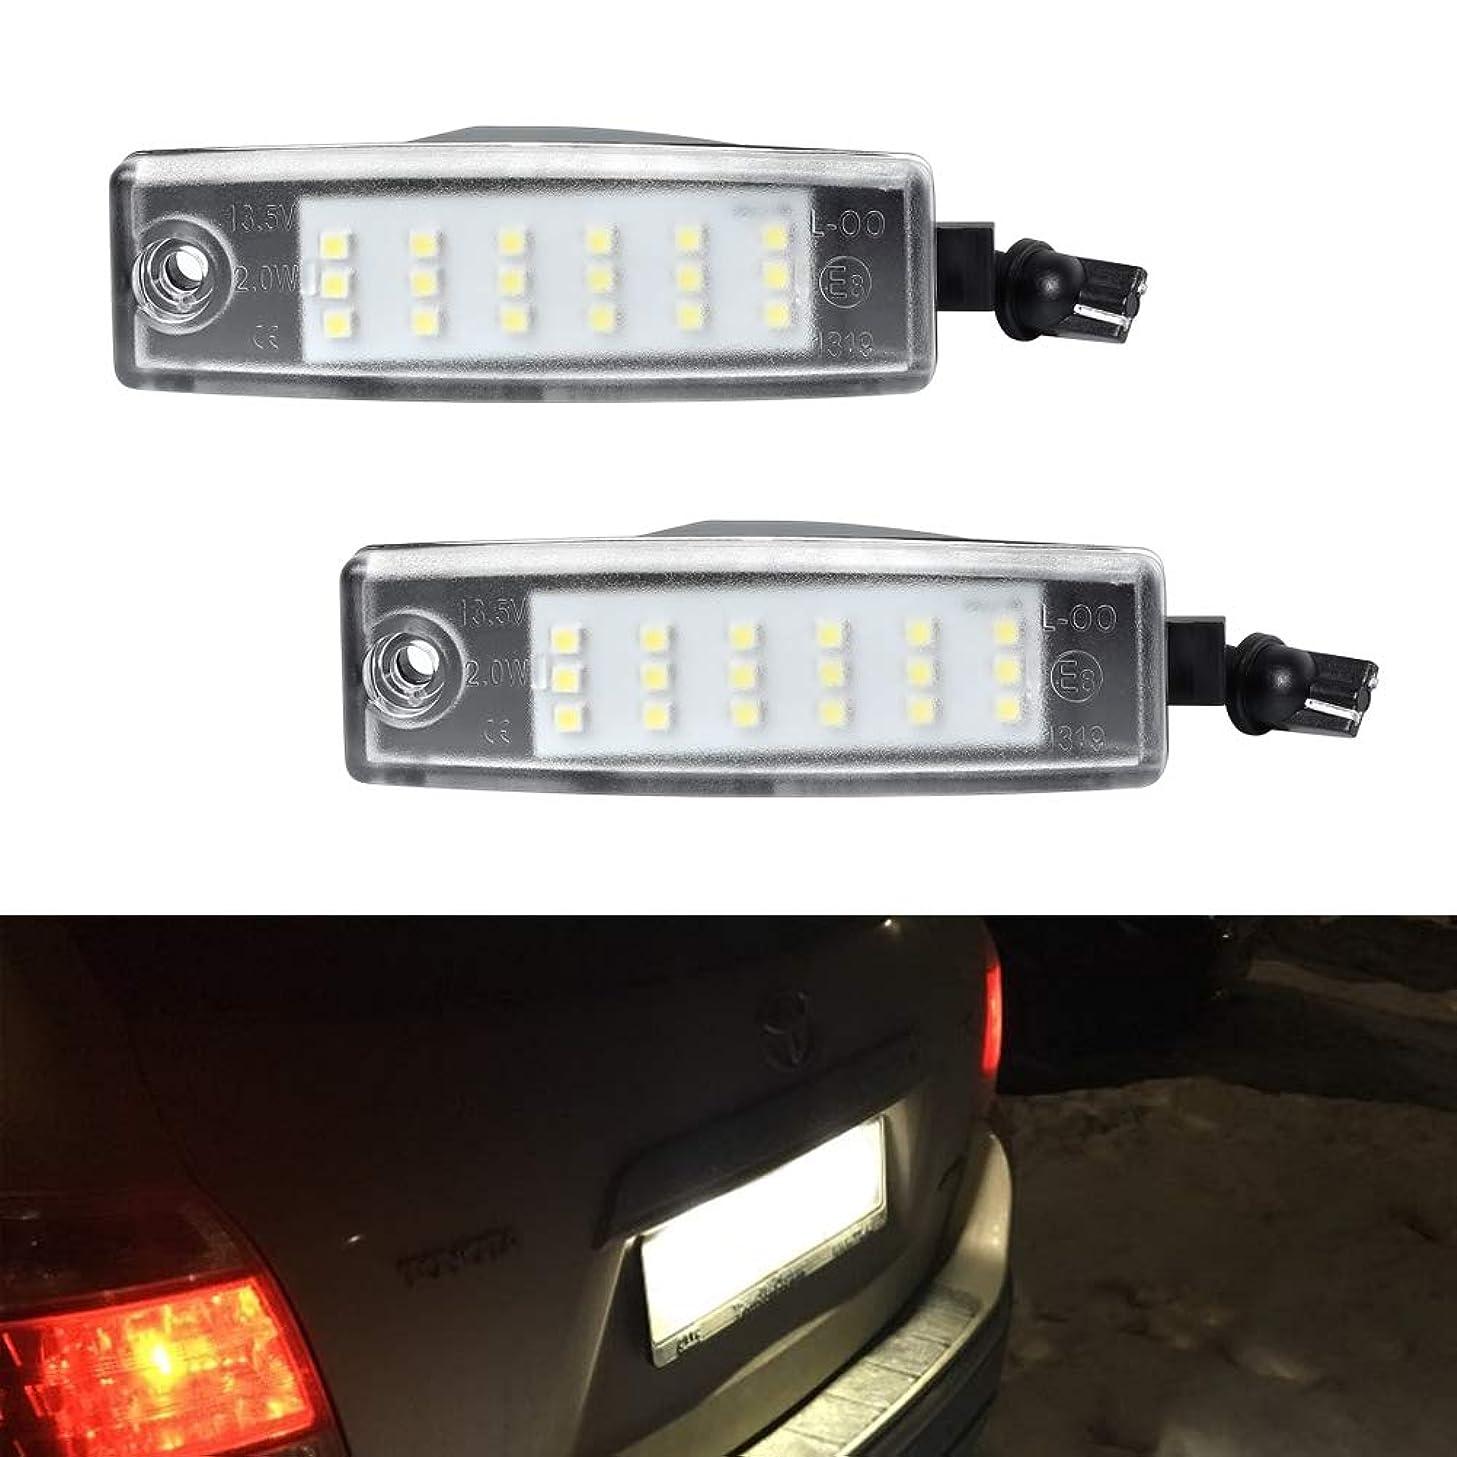 License Plate Light, GemPro 2Pcs LED License Plate Tag Lamp Assembly For Scion XB Toyota Highlander Lexus RX300